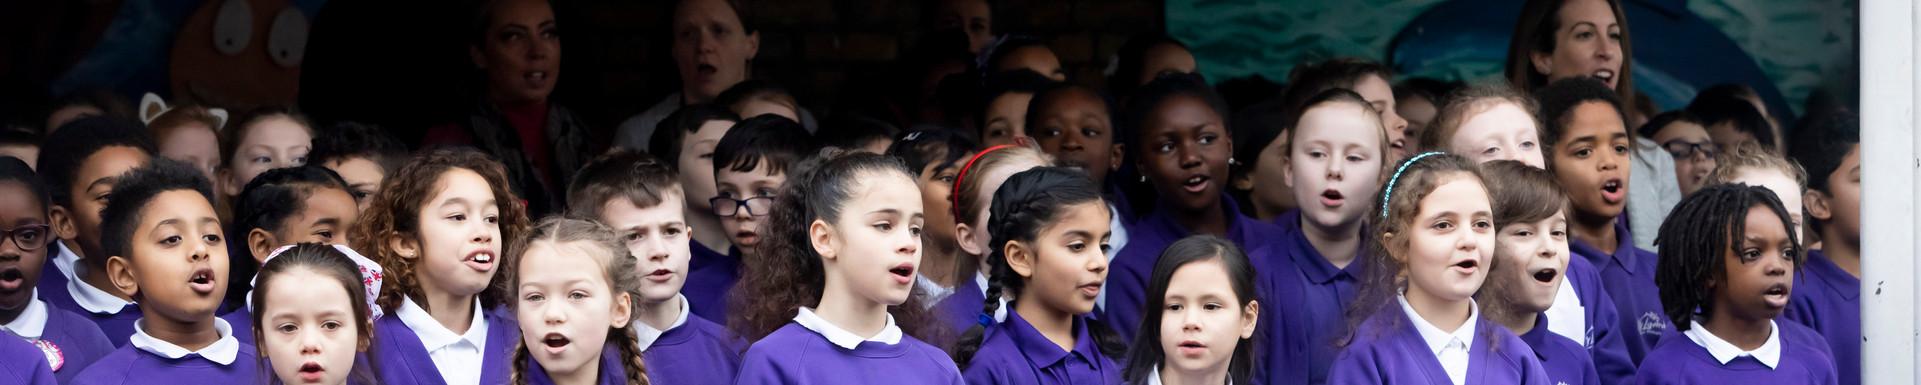 Lavender School Enfield, singing childre